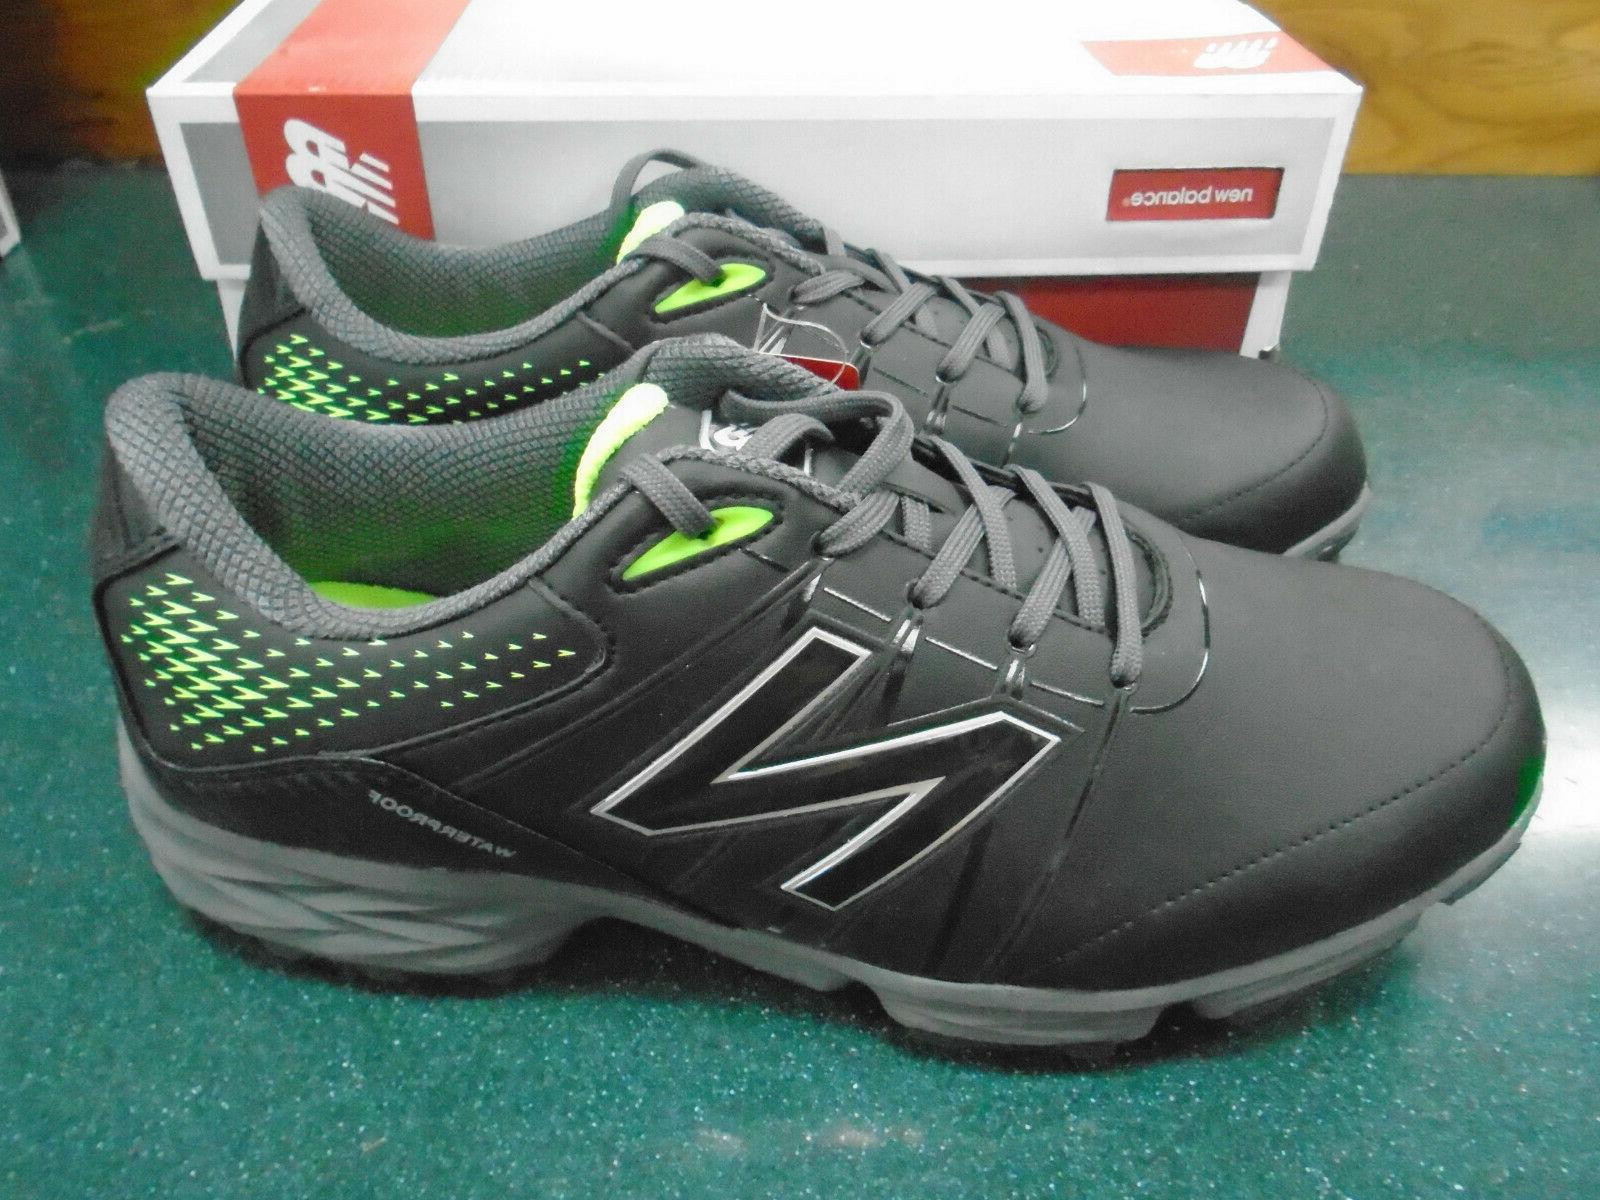 men s golf shoes model ngb4004 black